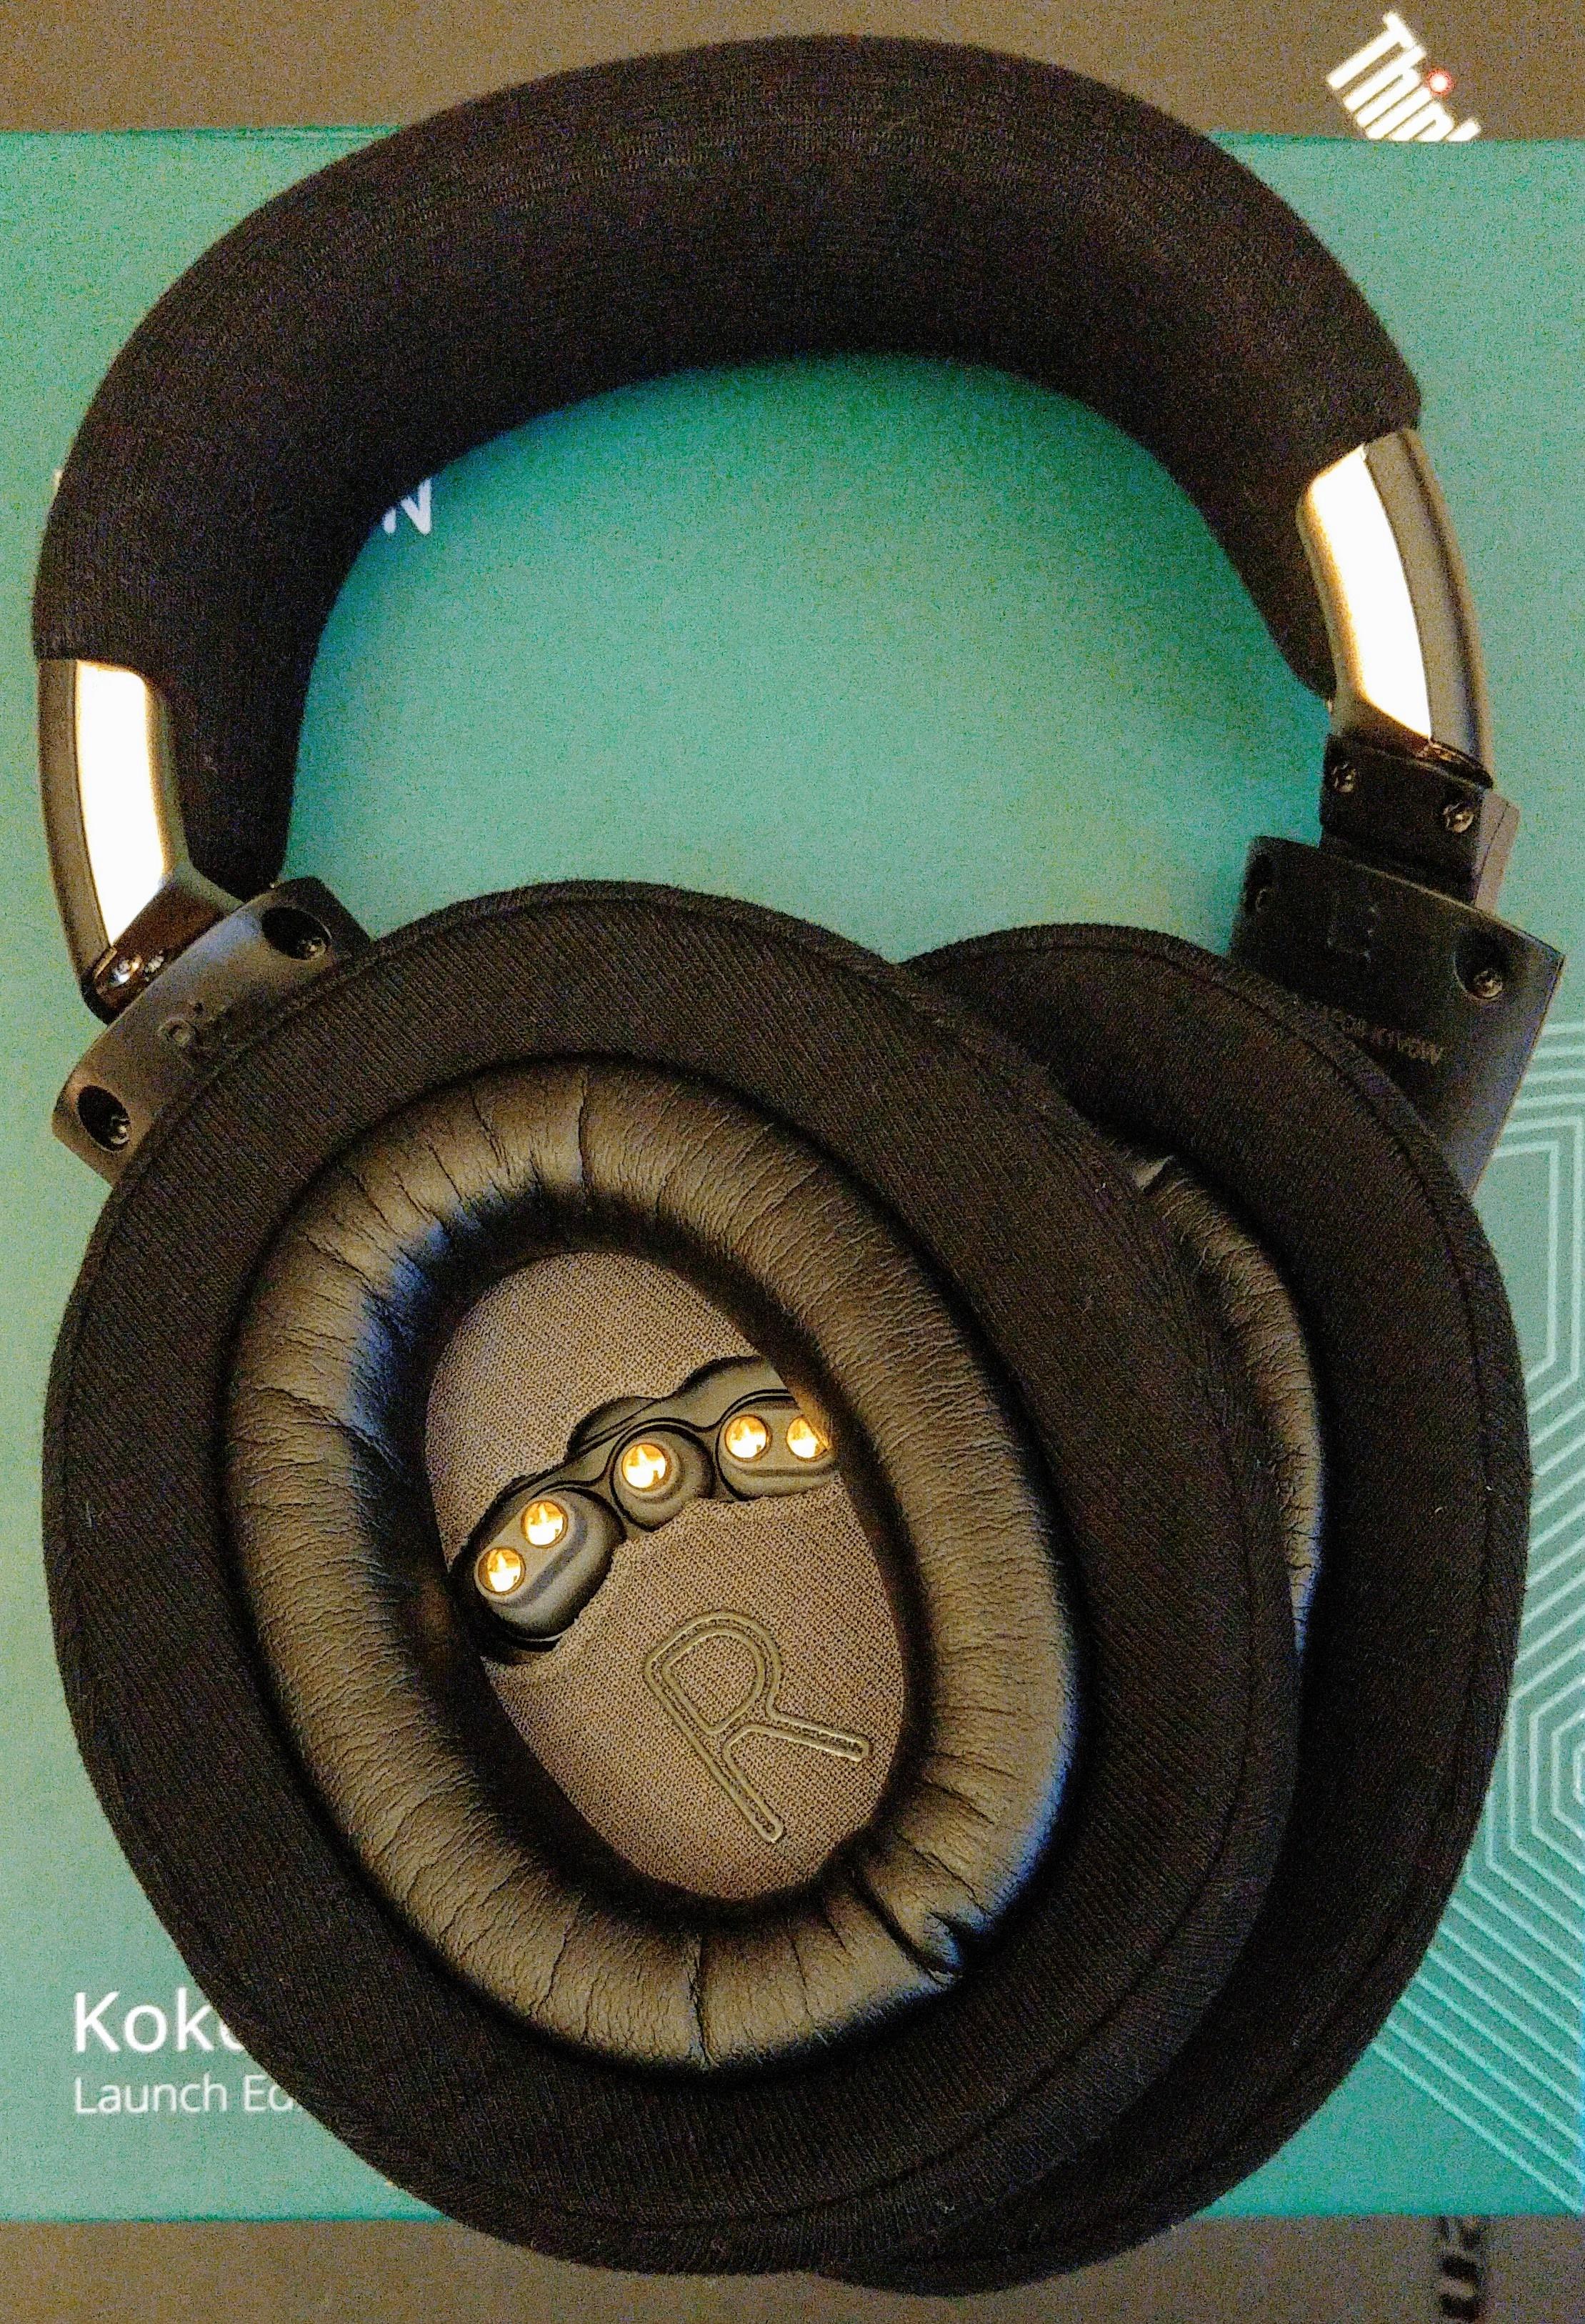 united kingdom nice cheap best sale File:Kokoon EEG Headphones (Launch Edition).jpg - Wikimedia Commons